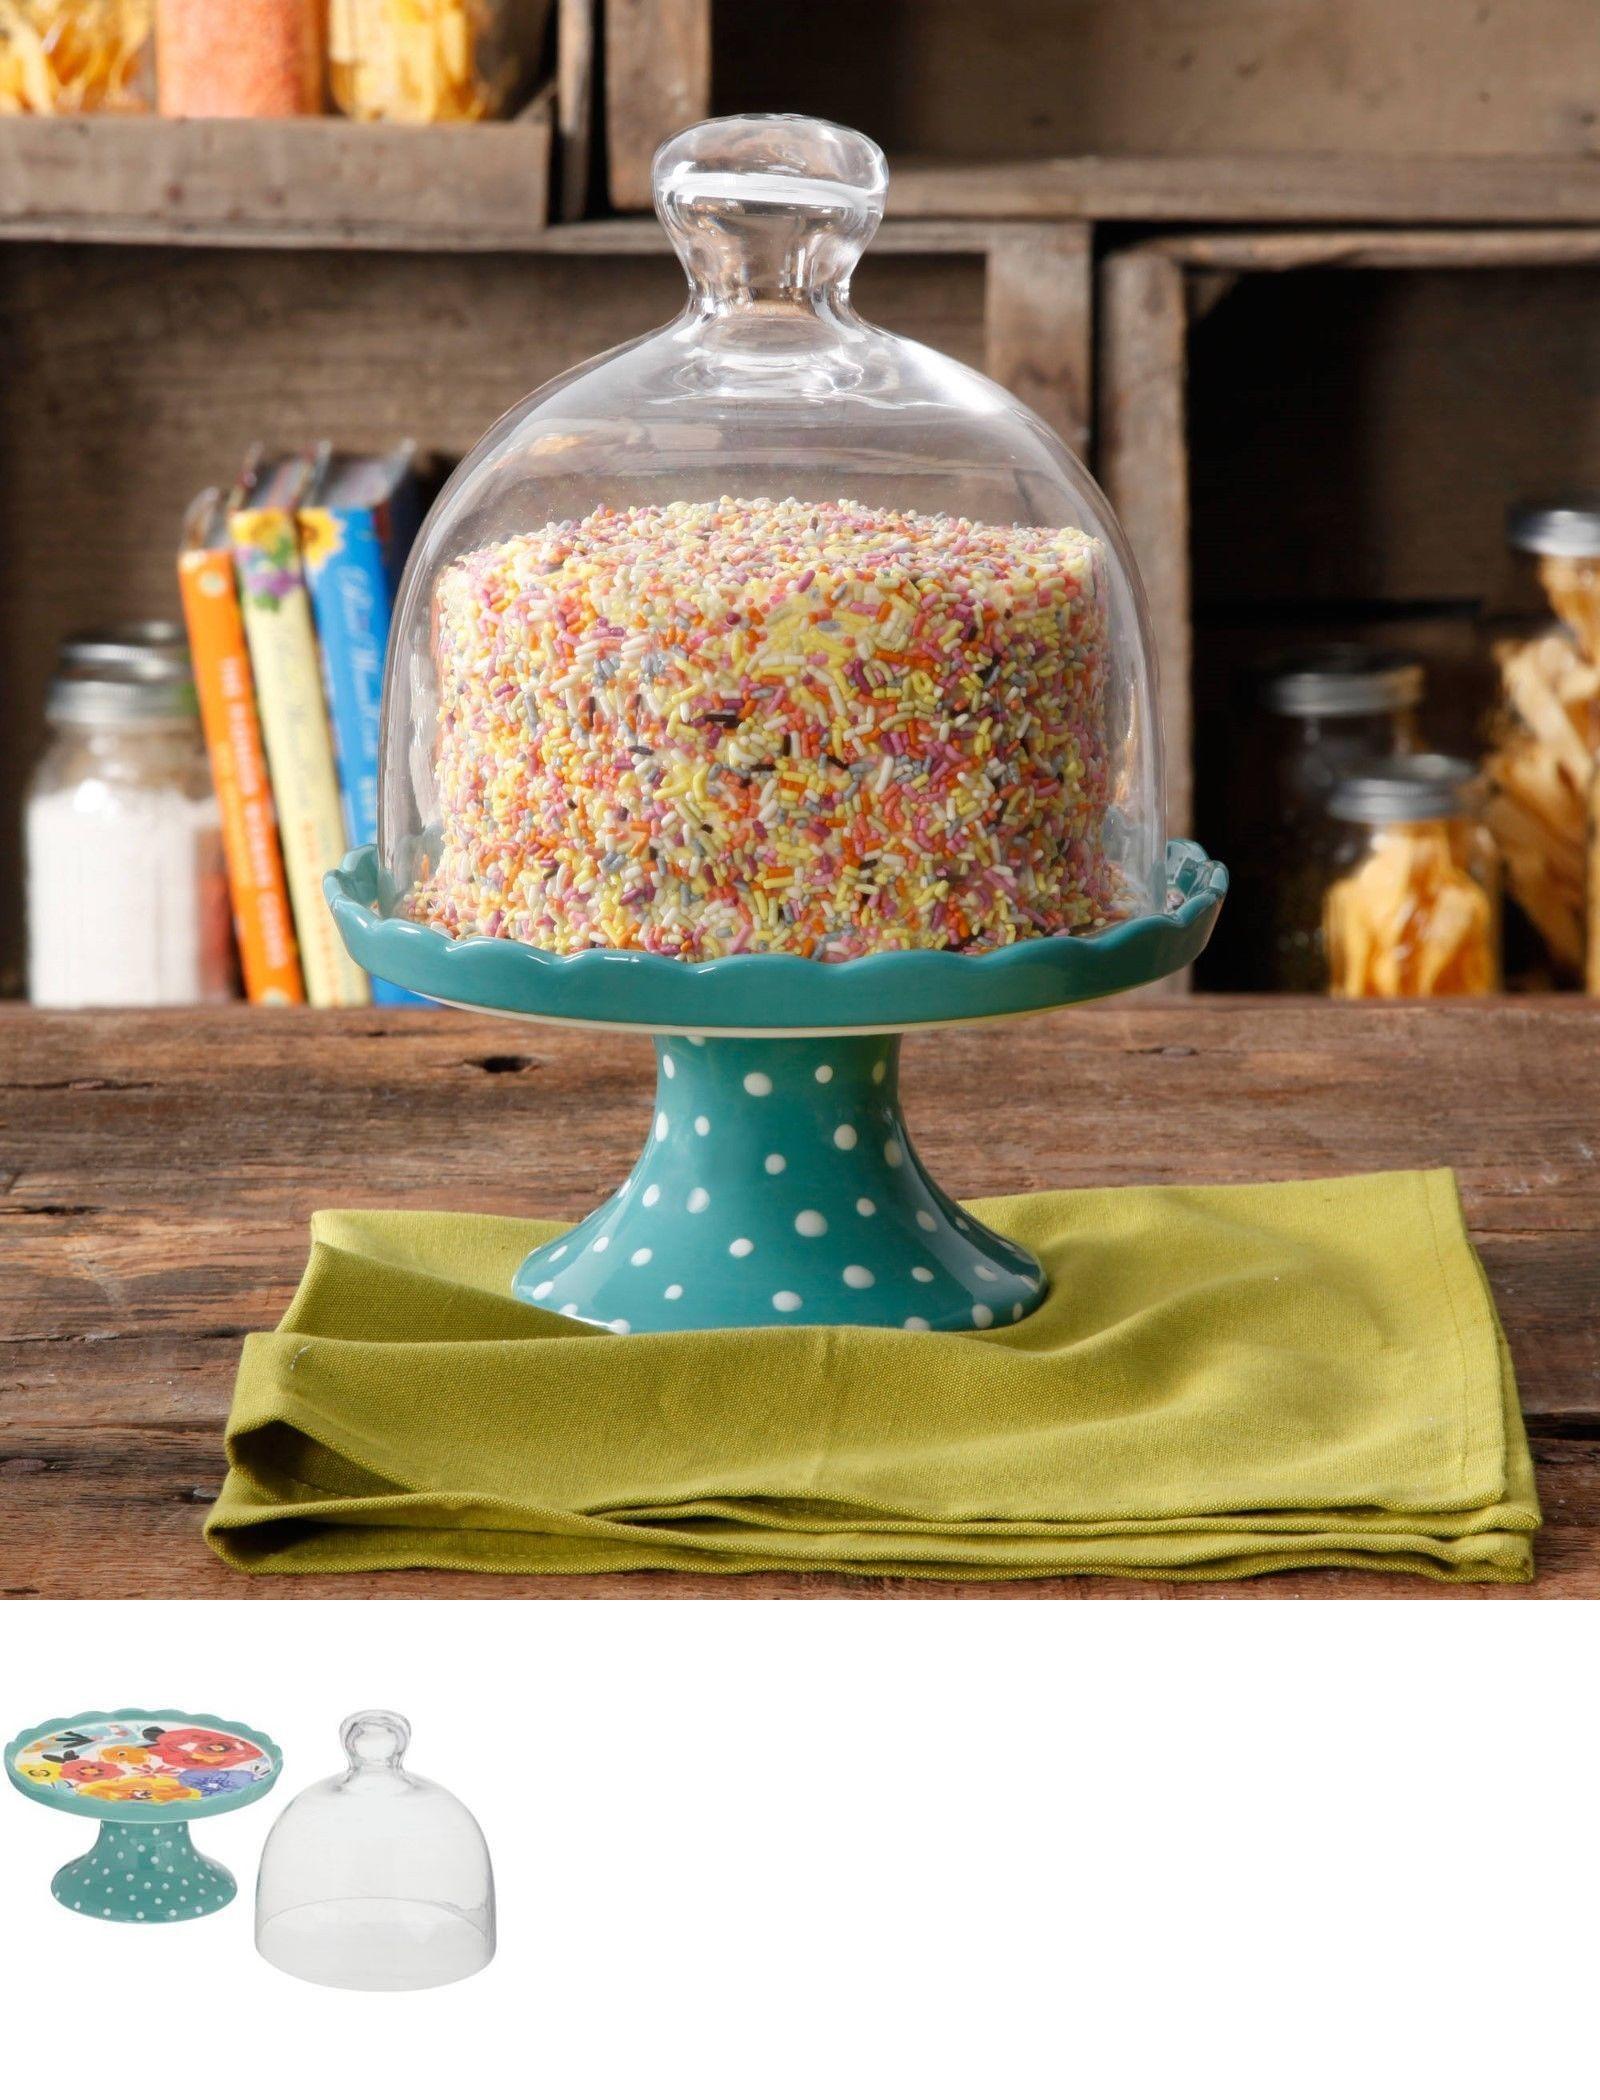 Cake stands 177010 pioneer woman flea market ceramic mini